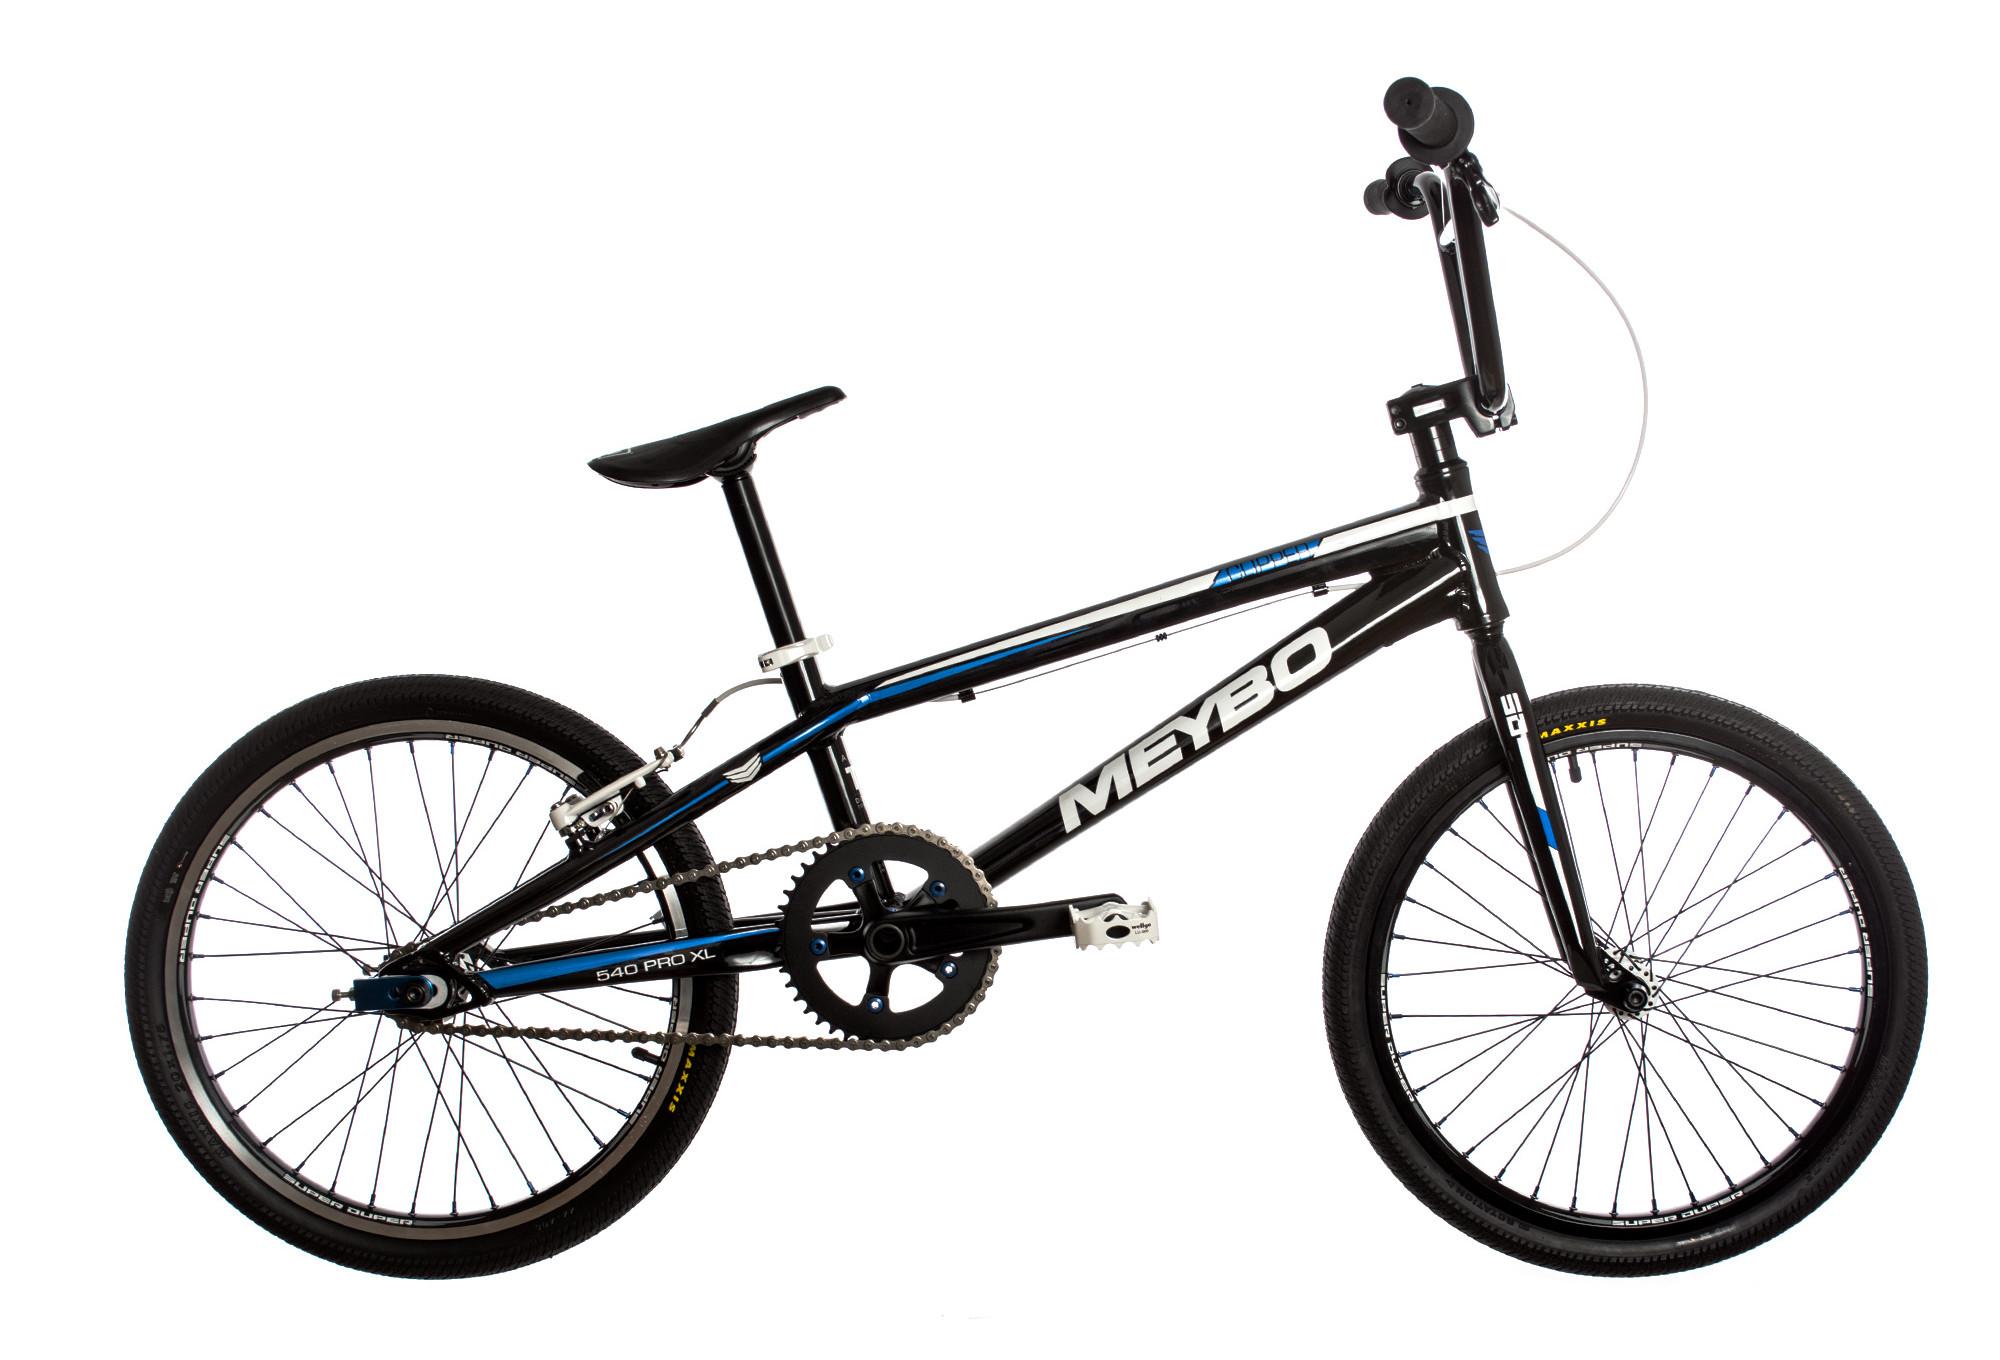 meybo clipper complete bike pro xxl black. Black Bedroom Furniture Sets. Home Design Ideas